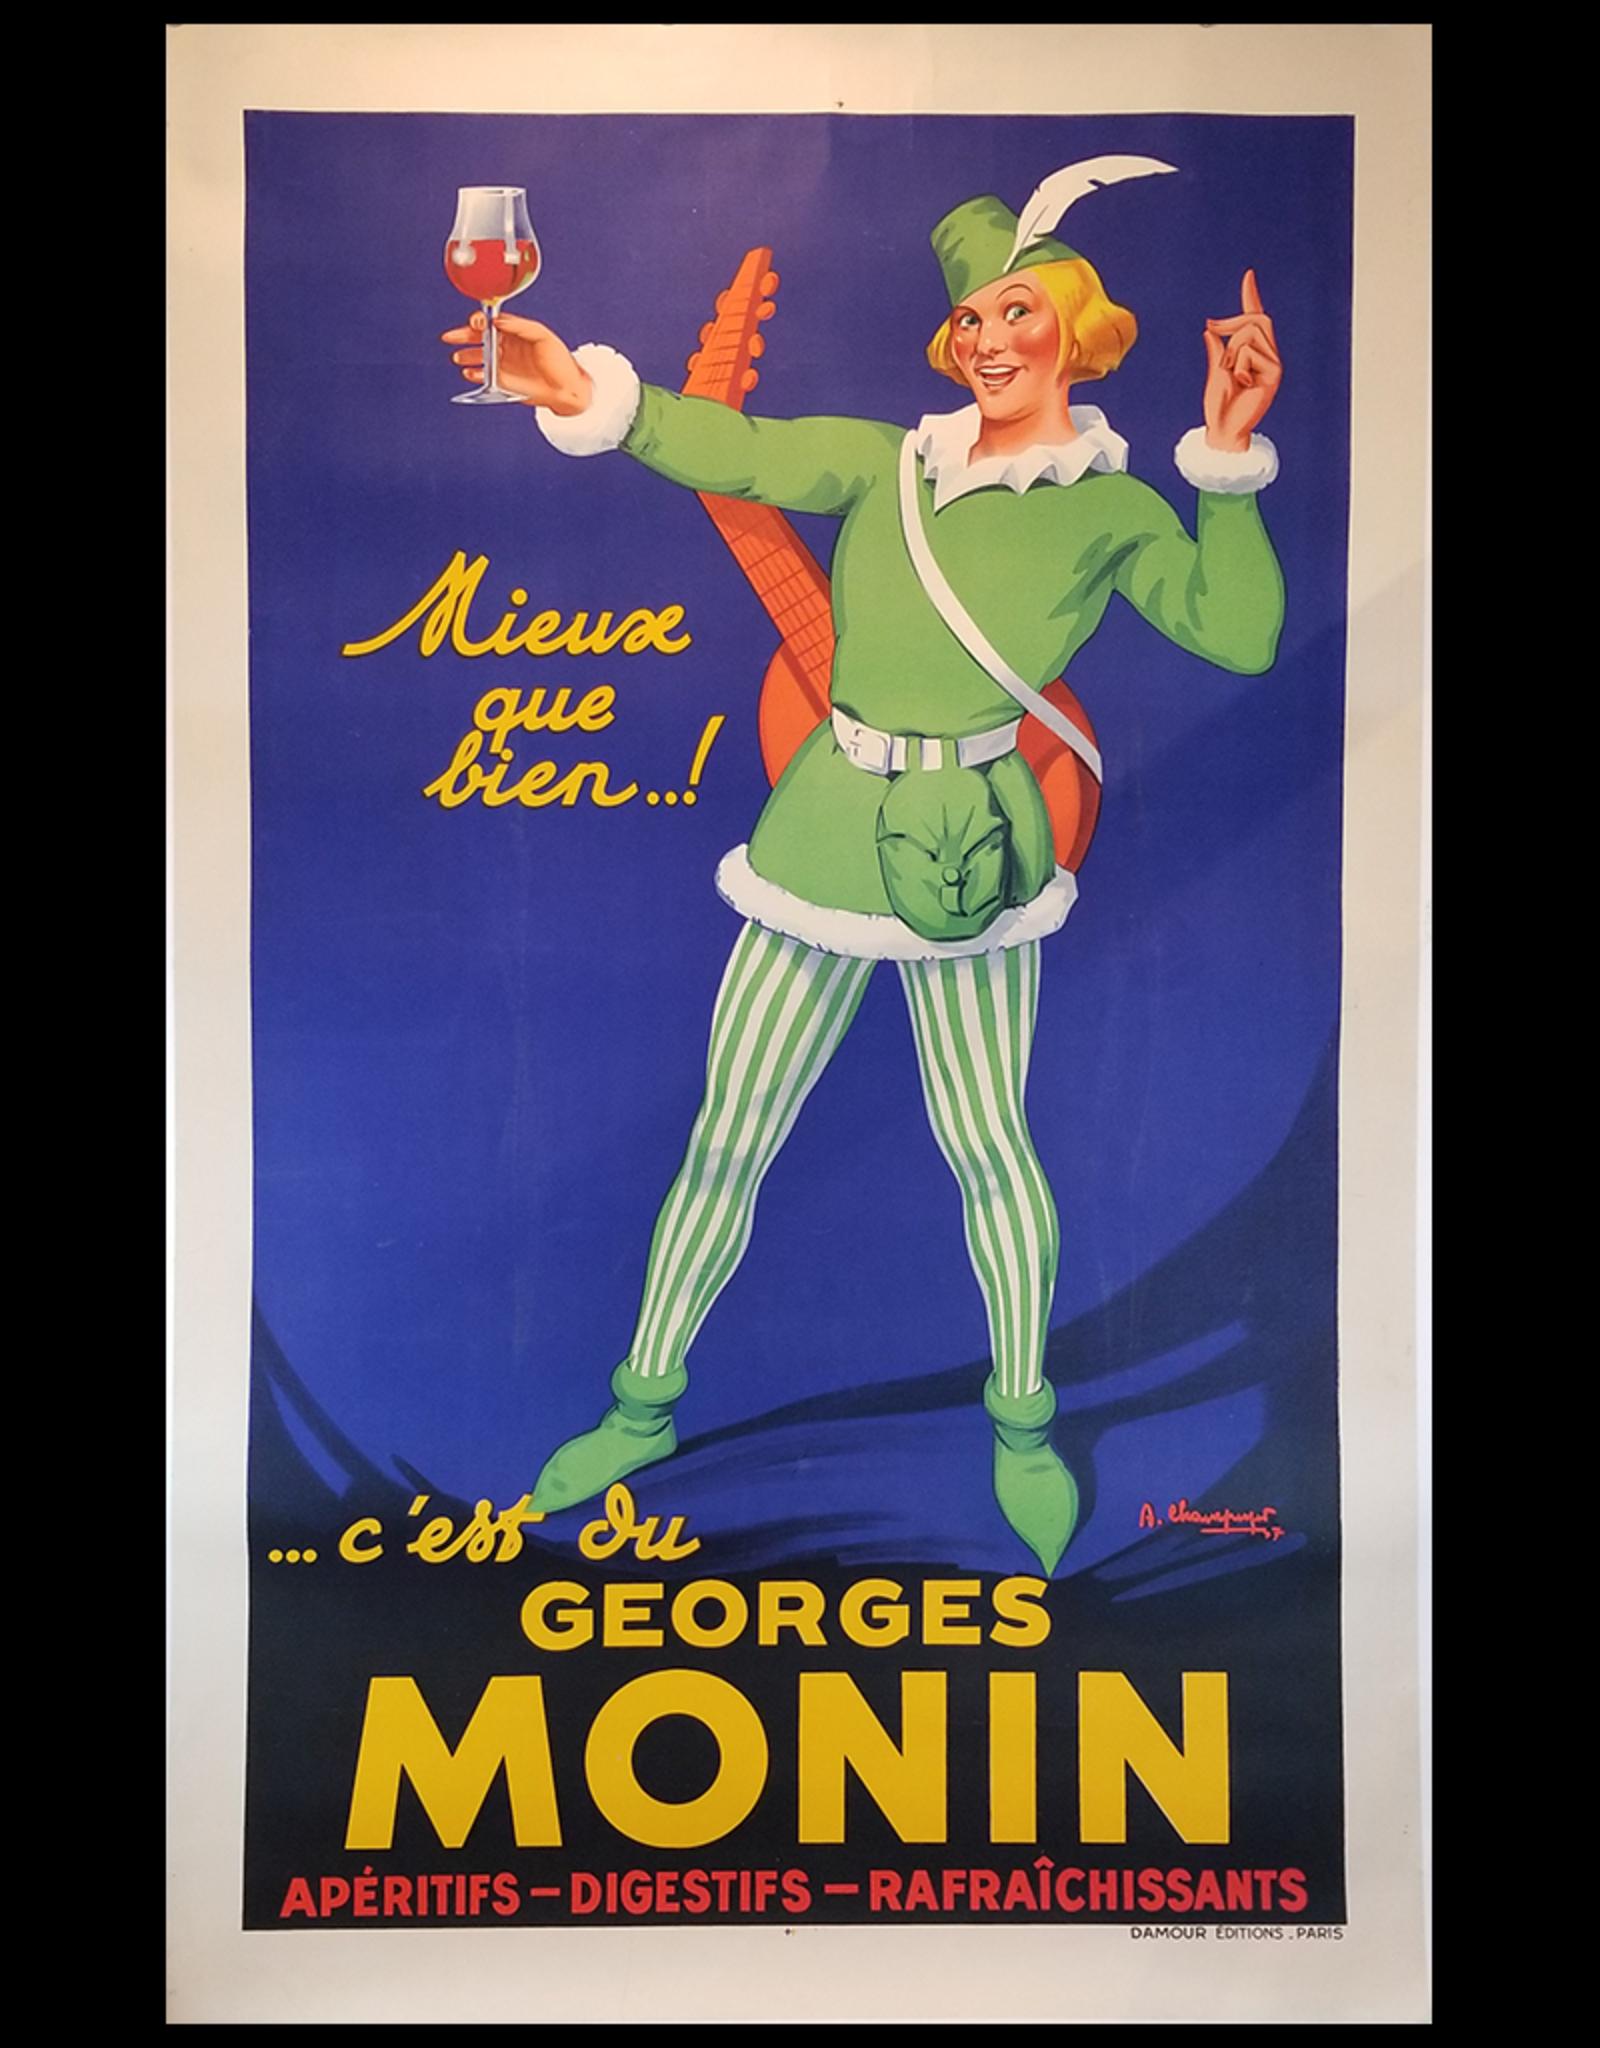 SPV Georges Monin Apéritifs Lithograph Poster